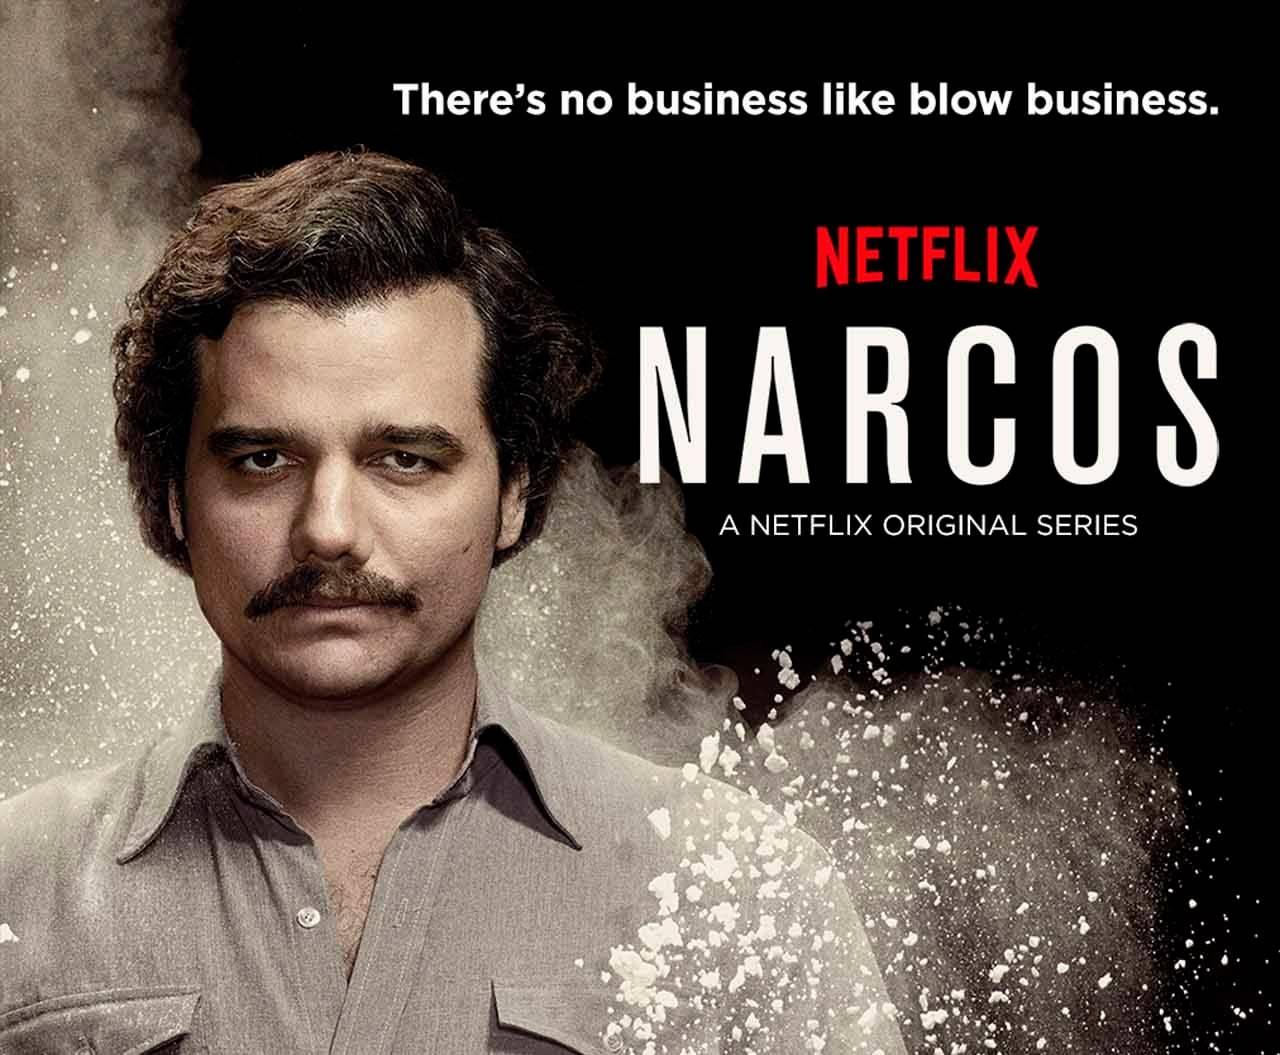 narcos_netflix